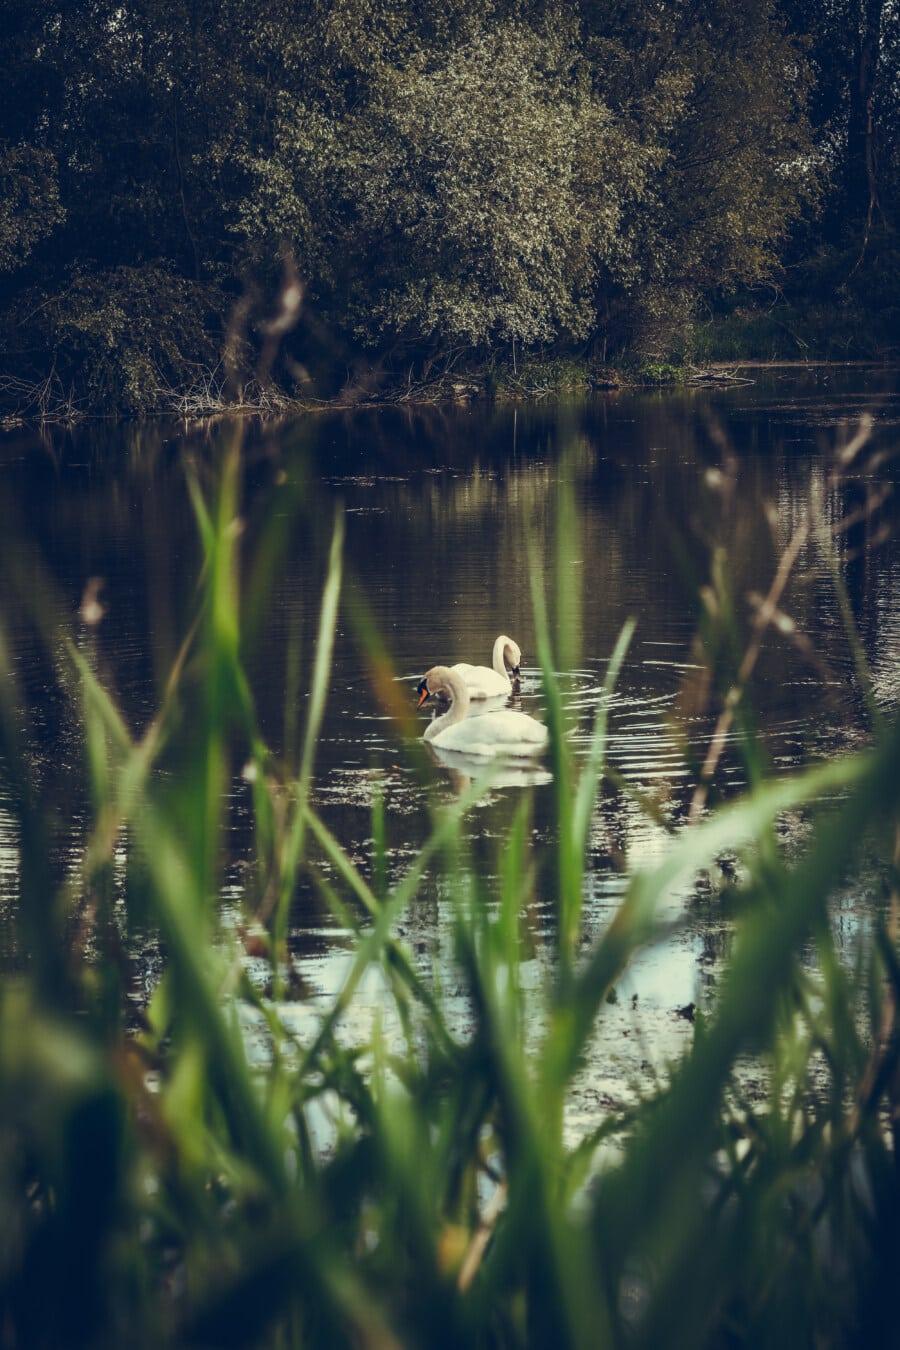 swan, swamp, spring time, lake, water, reflection, aquatic, bird, nature, river